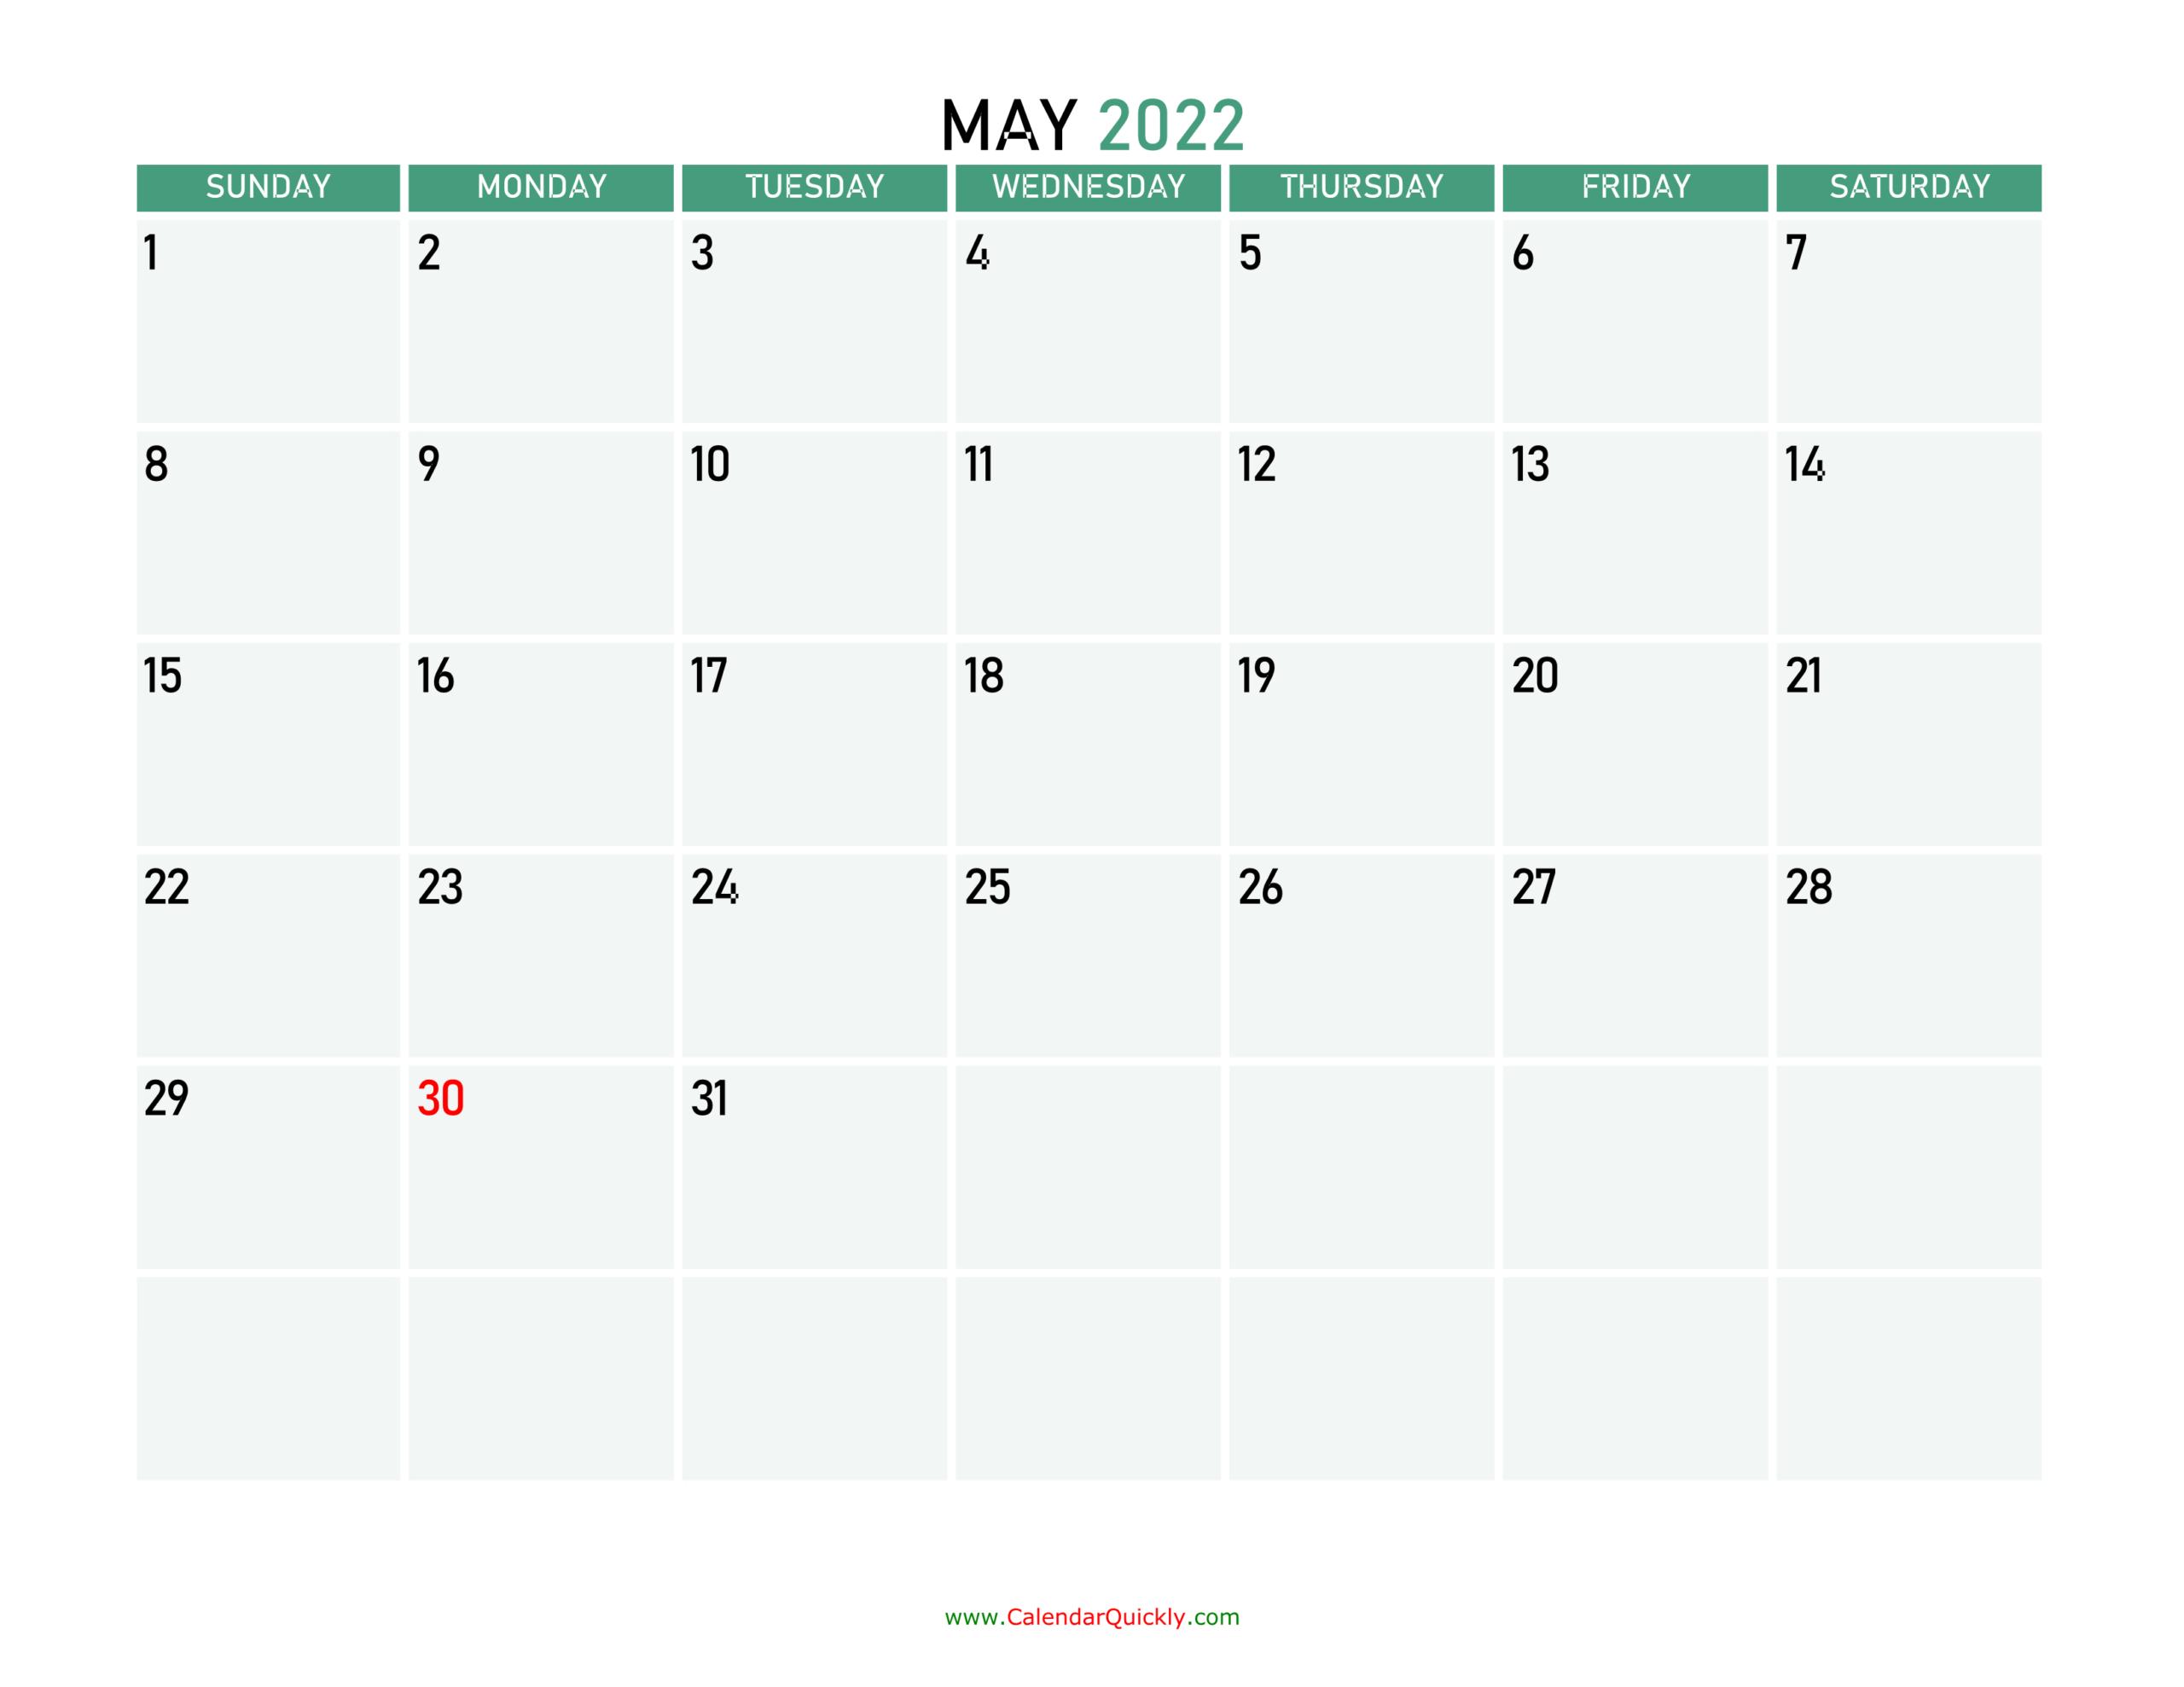 May 2022 Printable Calendar   Calendar Quickly within Printable Mayl 2022 Calendar Image